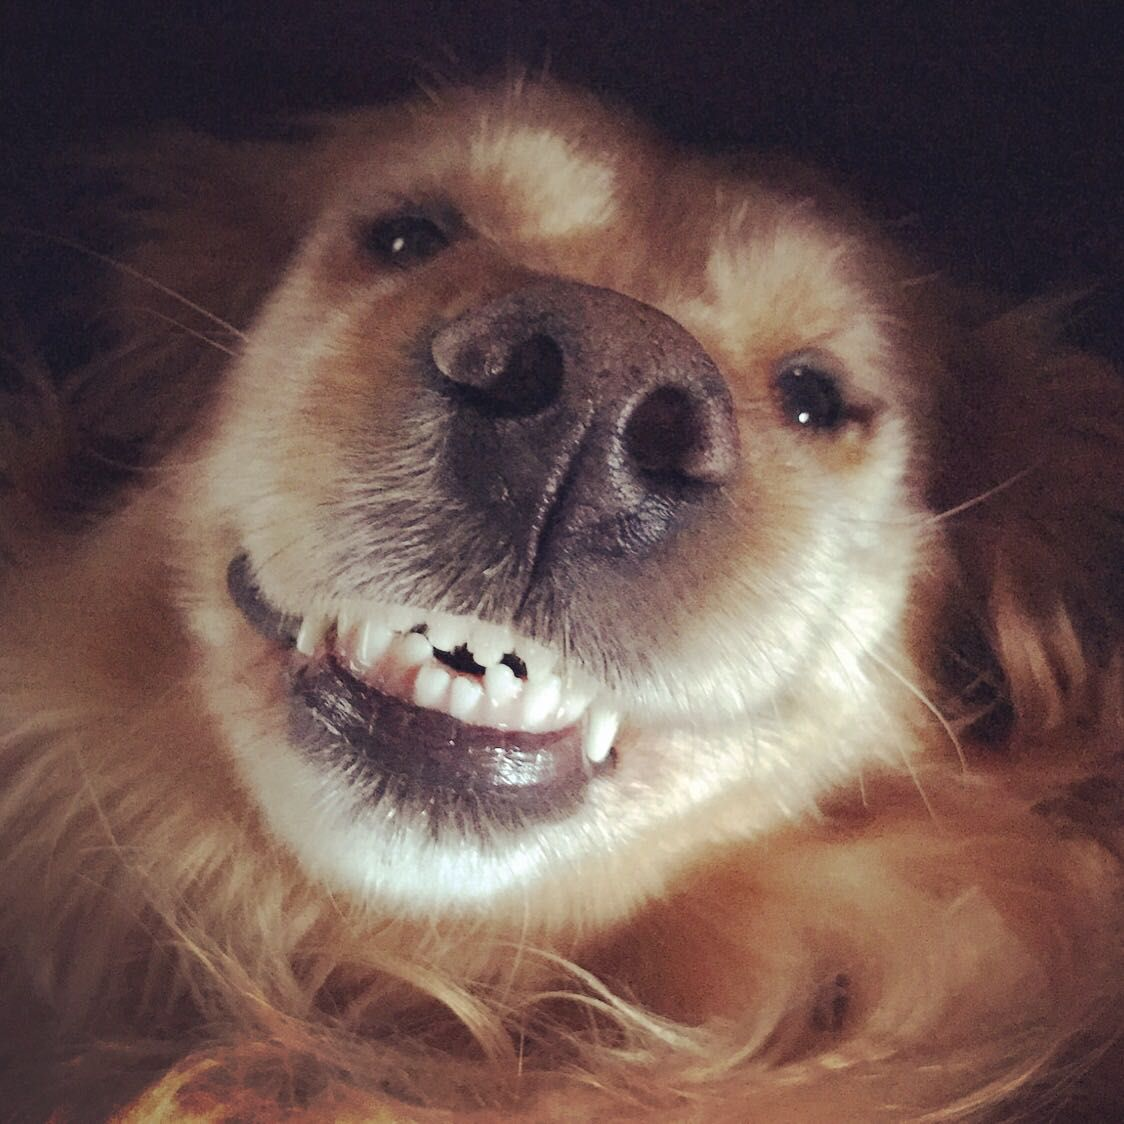 My golden's crooked teeth smile http//ift.tt/2fVyDnL